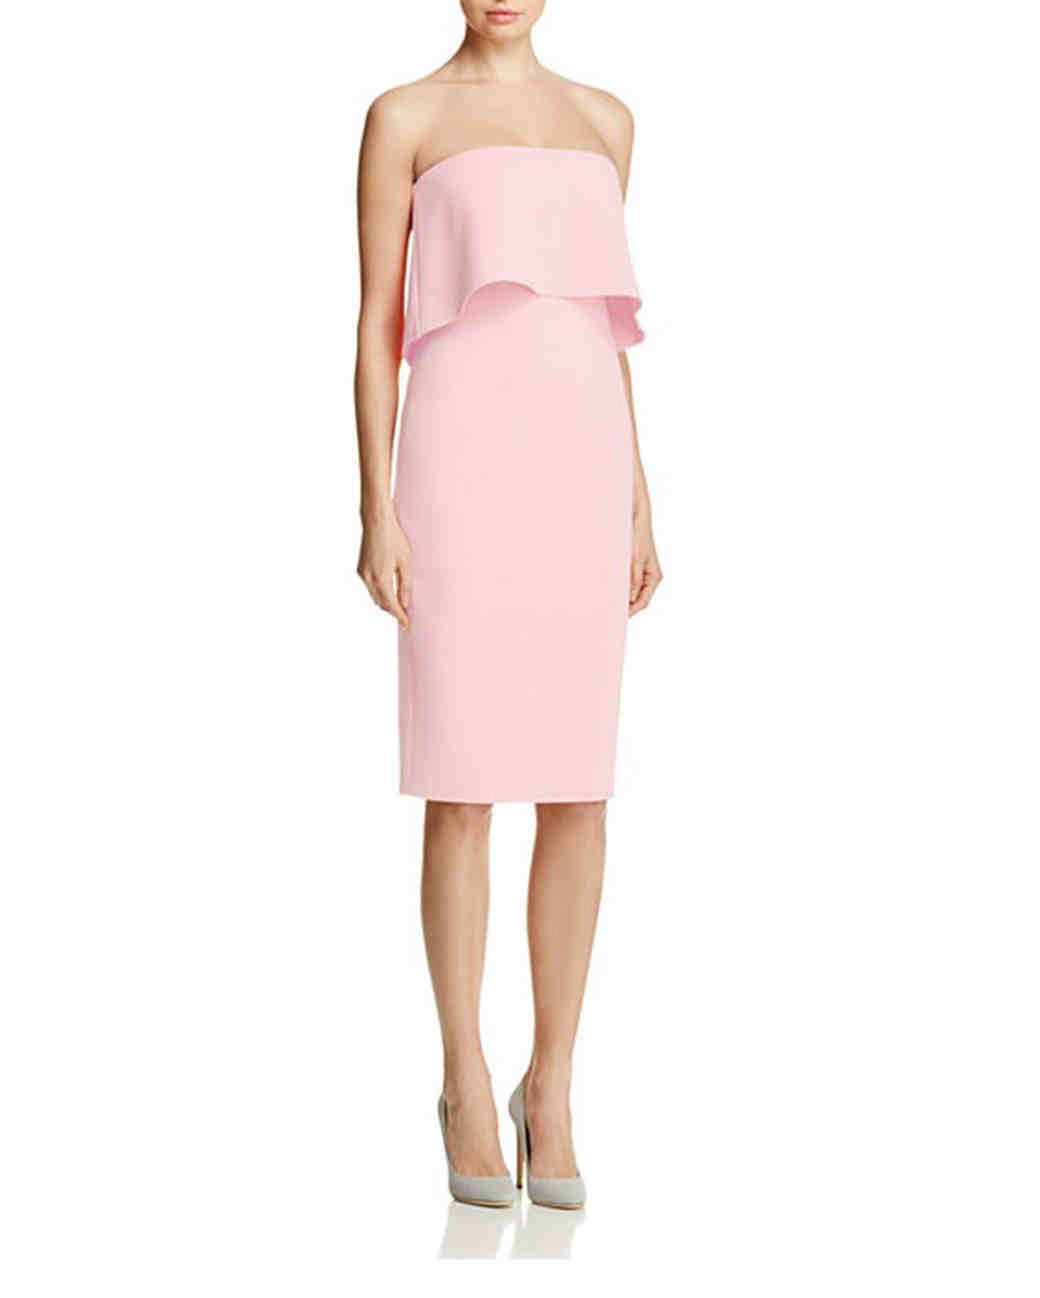 short bridesmaid dresses likely